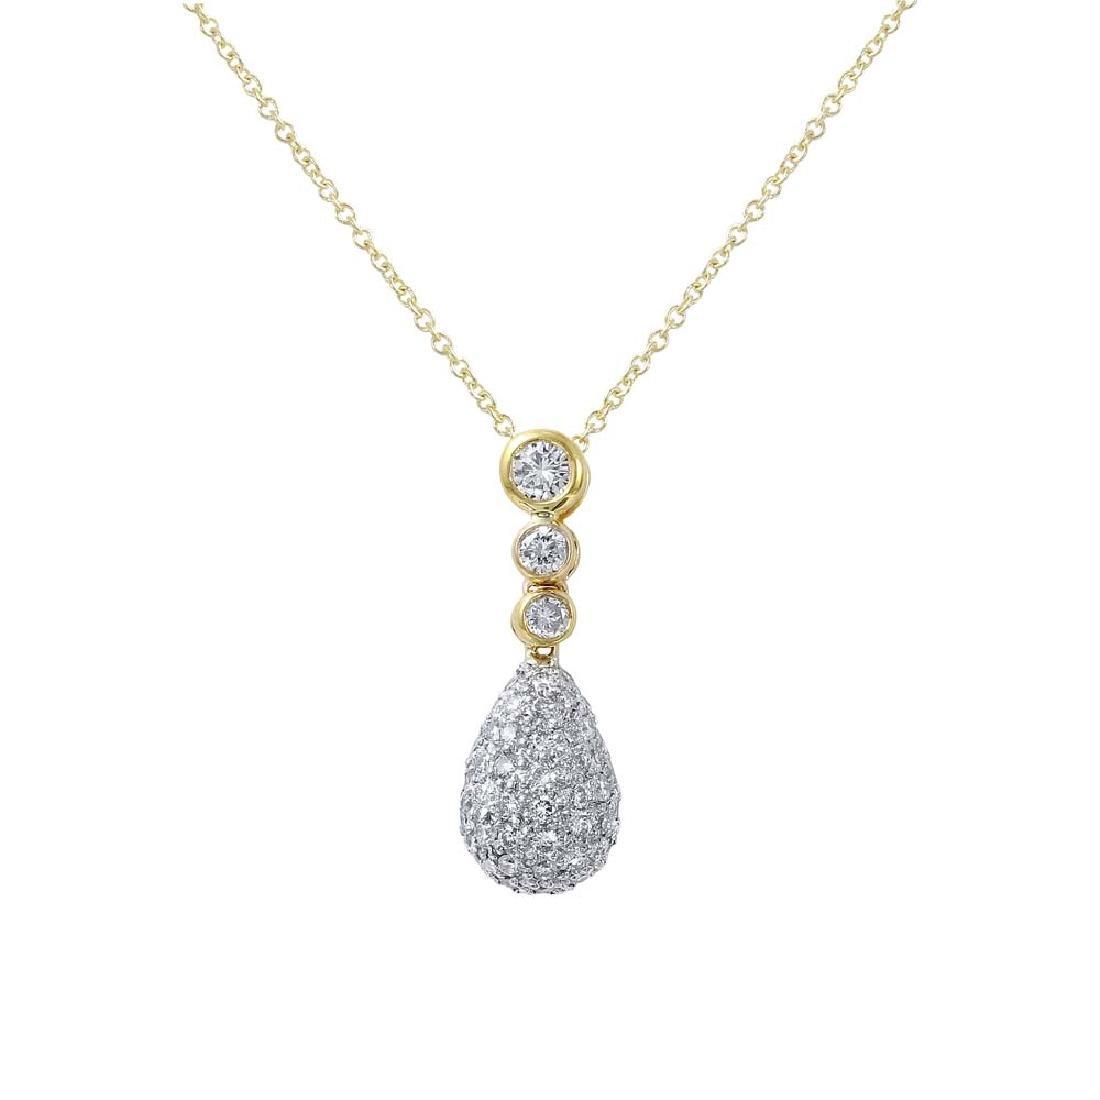 Genuine 0.66 TCW 18K Yellow Gold Ladies Necklace